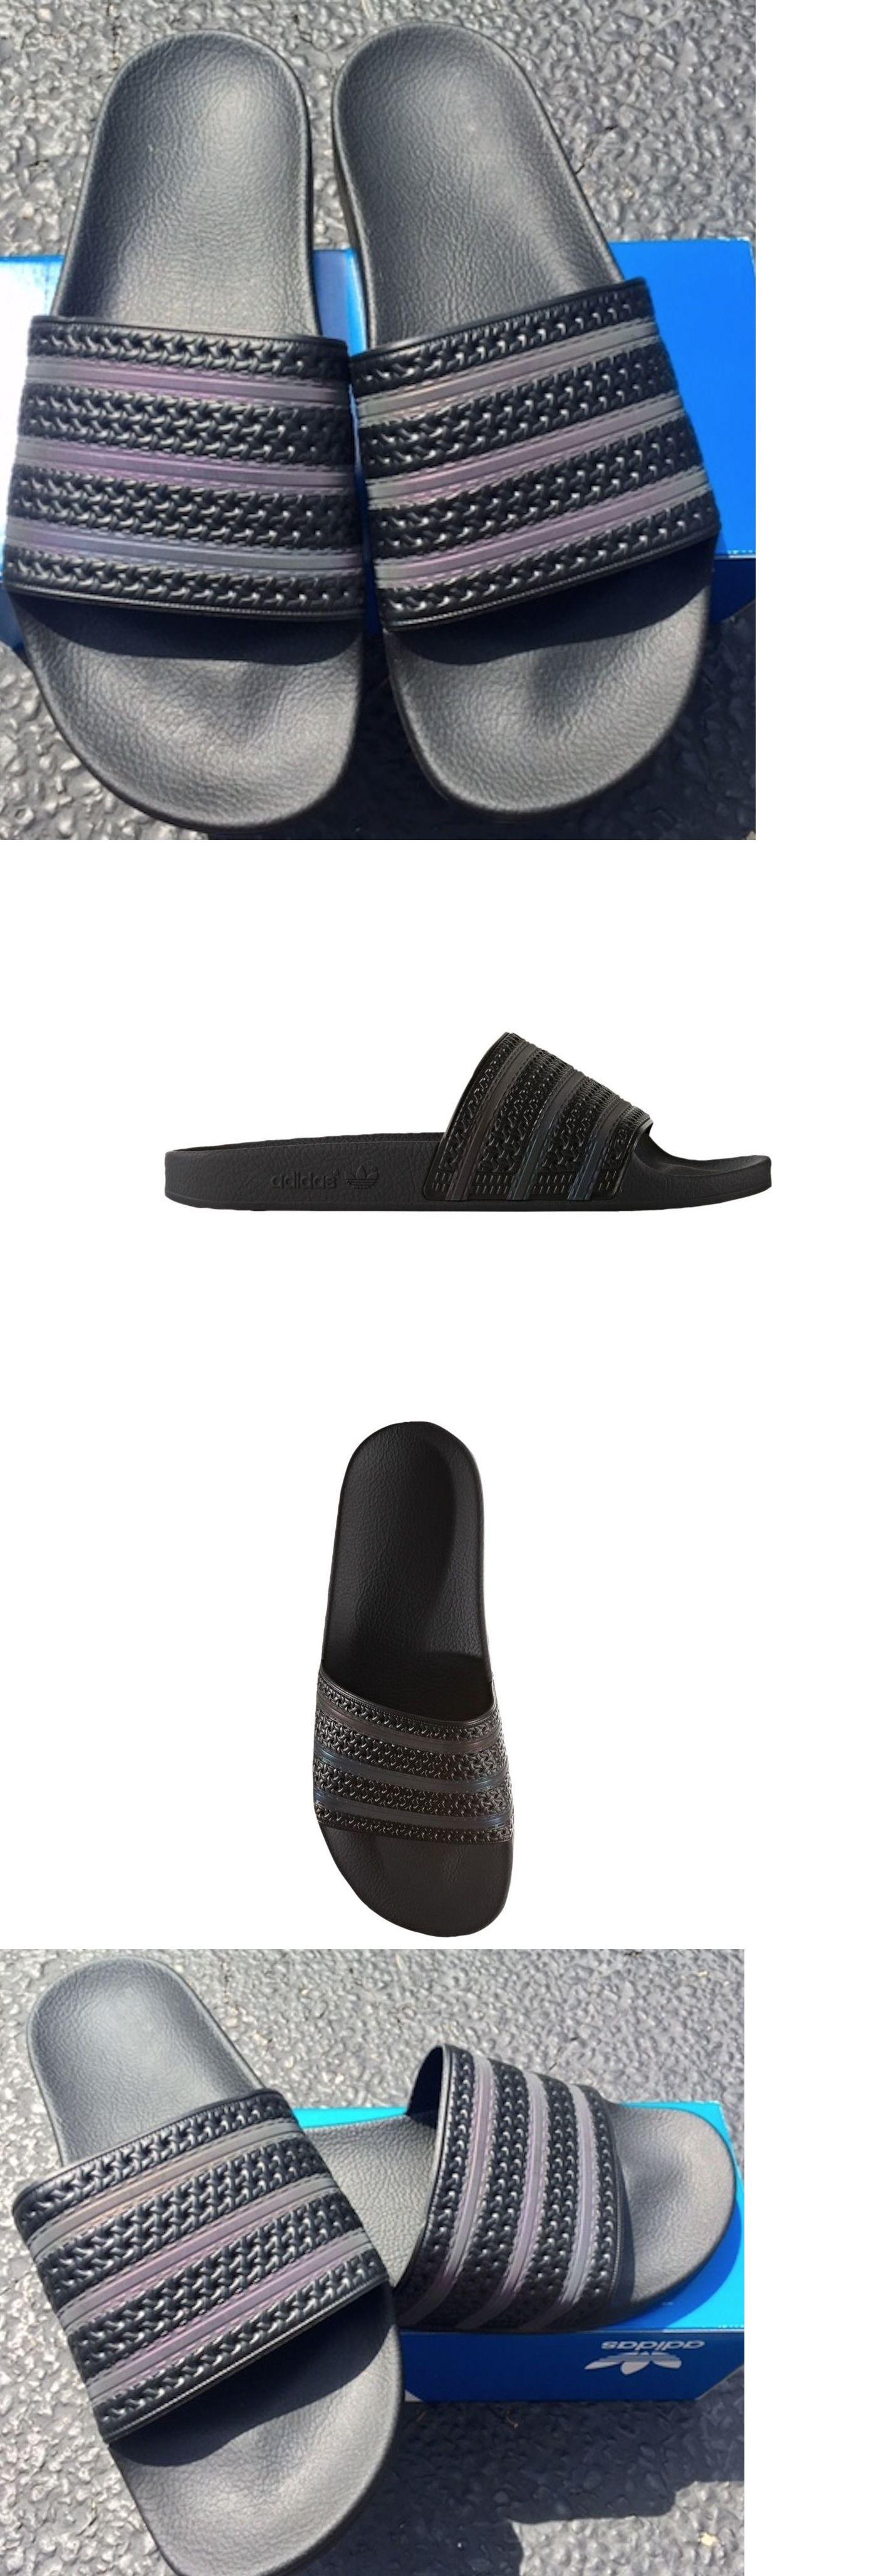 2fb9d13cf98c8f ... canada sandals and flip flops 11504 new adidas adilette xeno slides  bb0116 triple black sandal c23ea